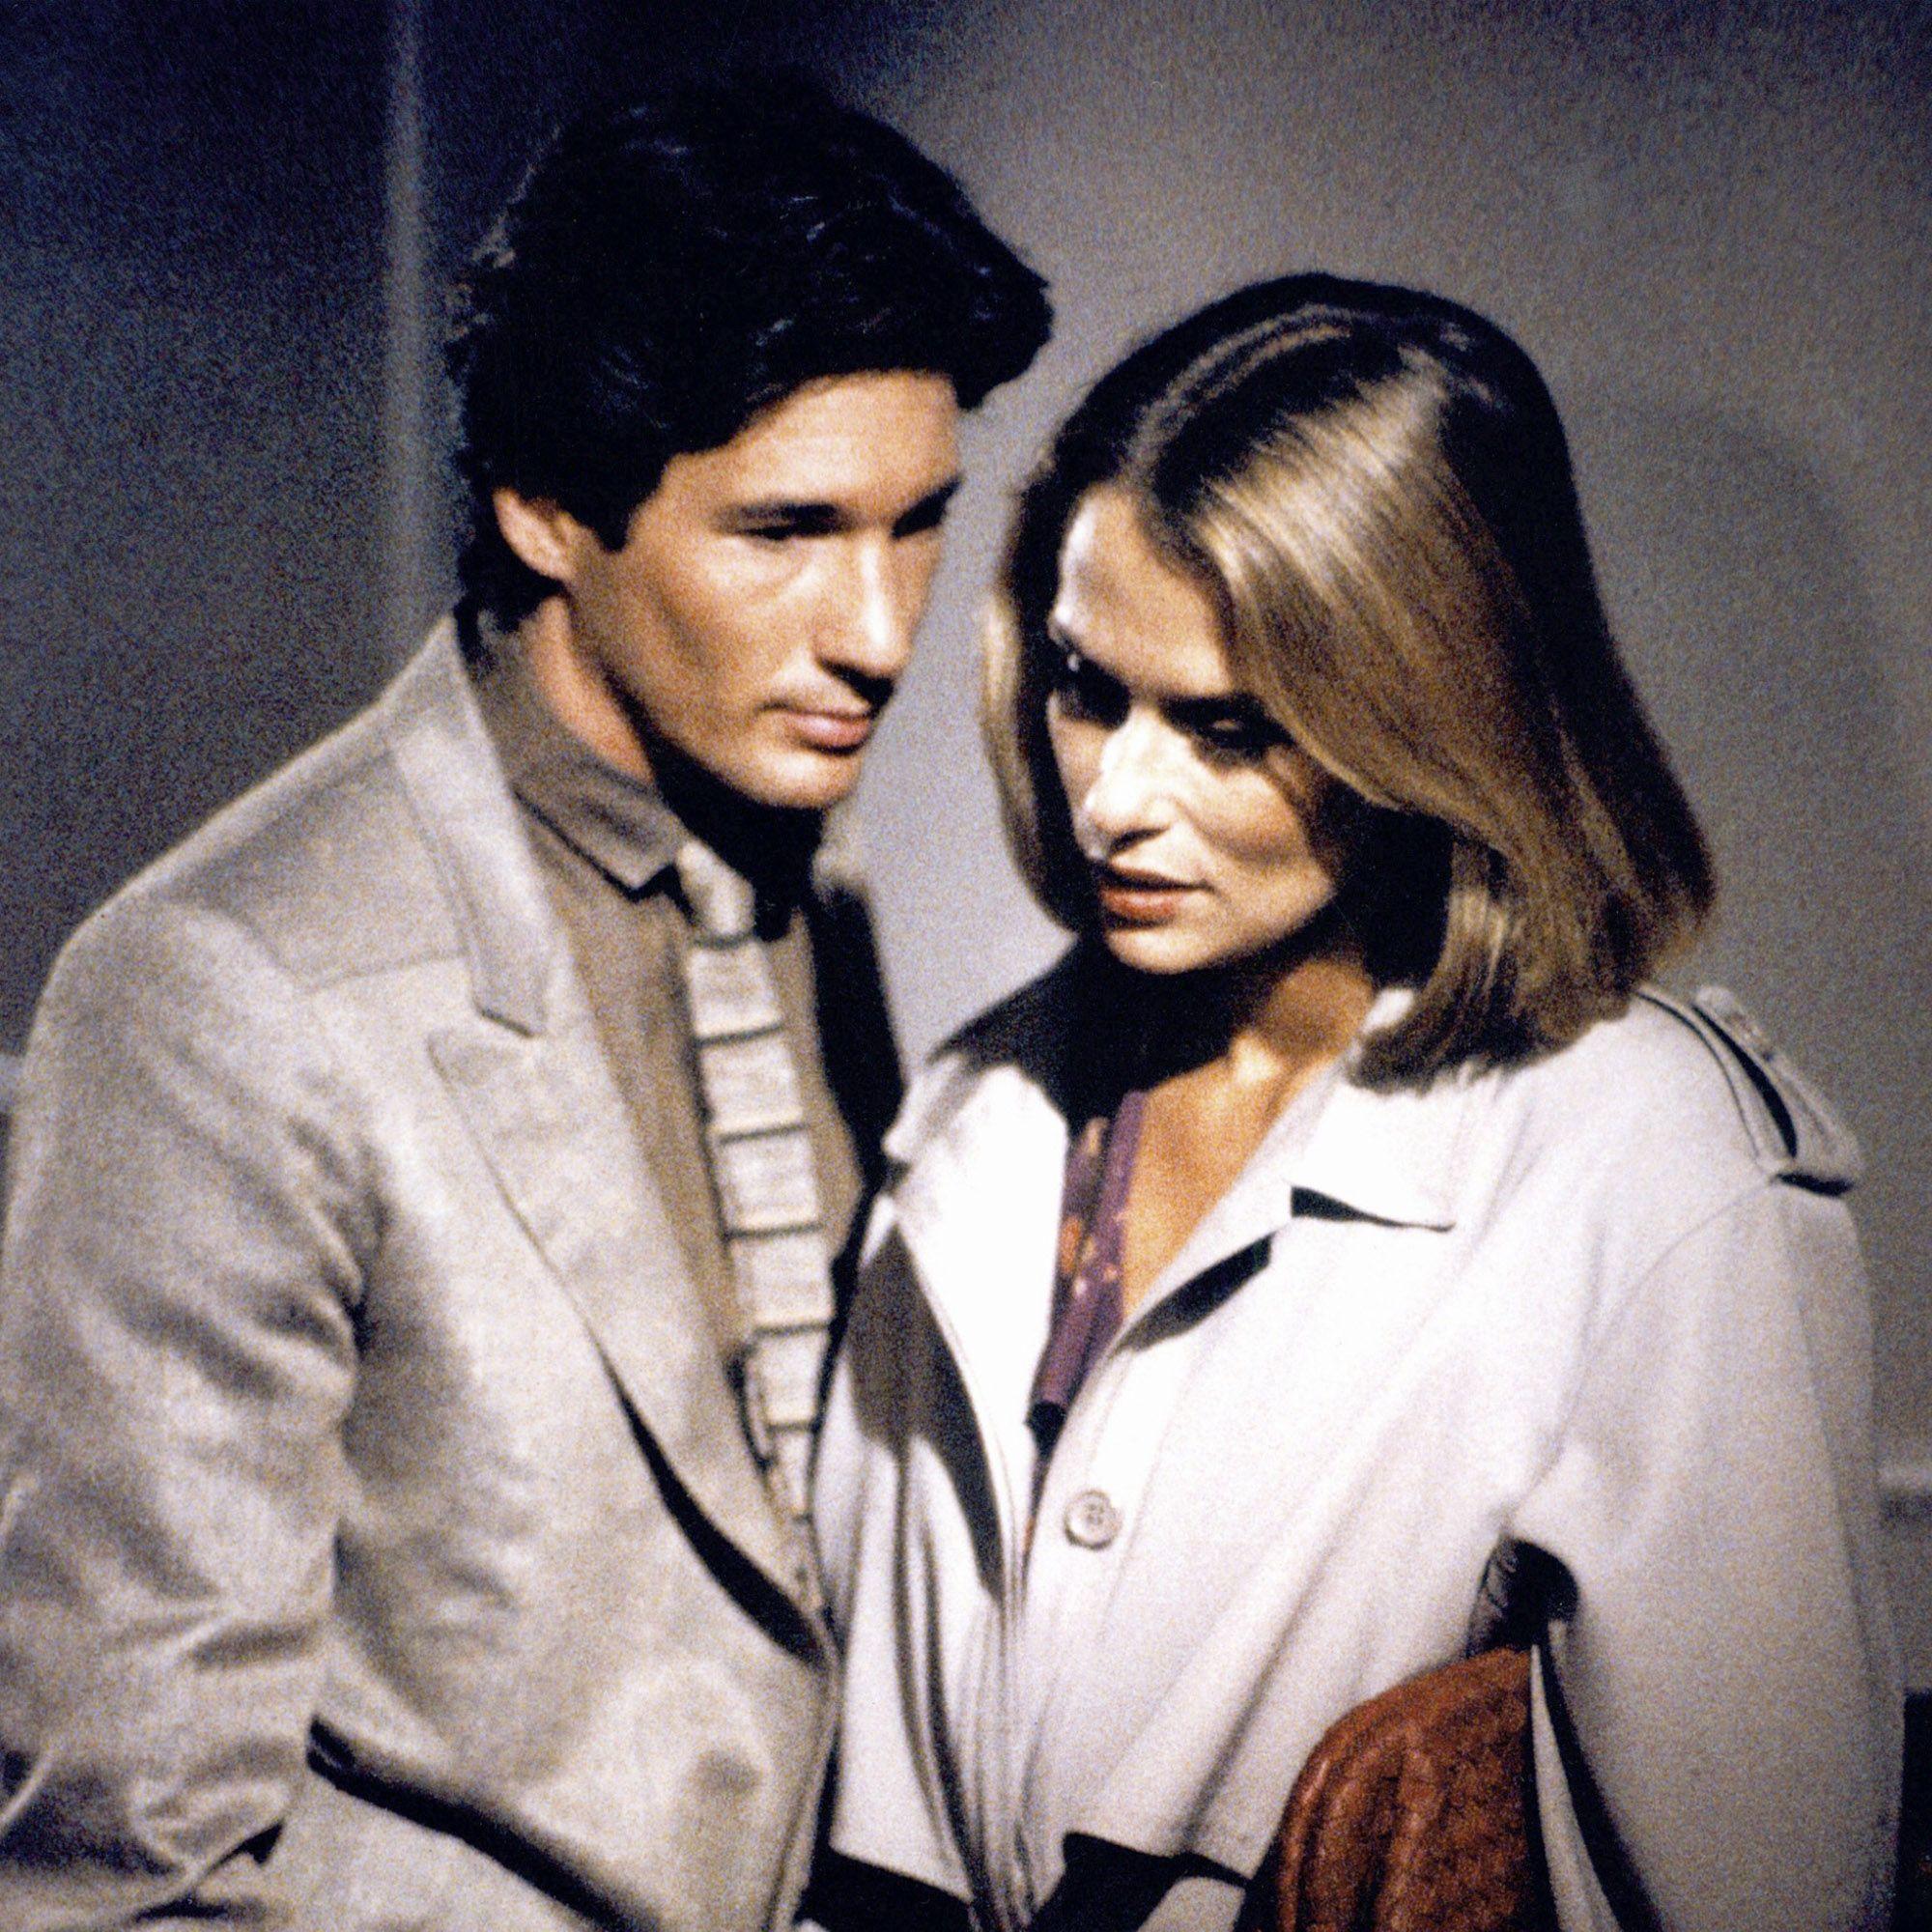 American Gigolo (1980)&#xA&#x3B;Directed by Paul Schrader&#xA&#x3B;Shown from left: Richard Gere, Lauren Hutton